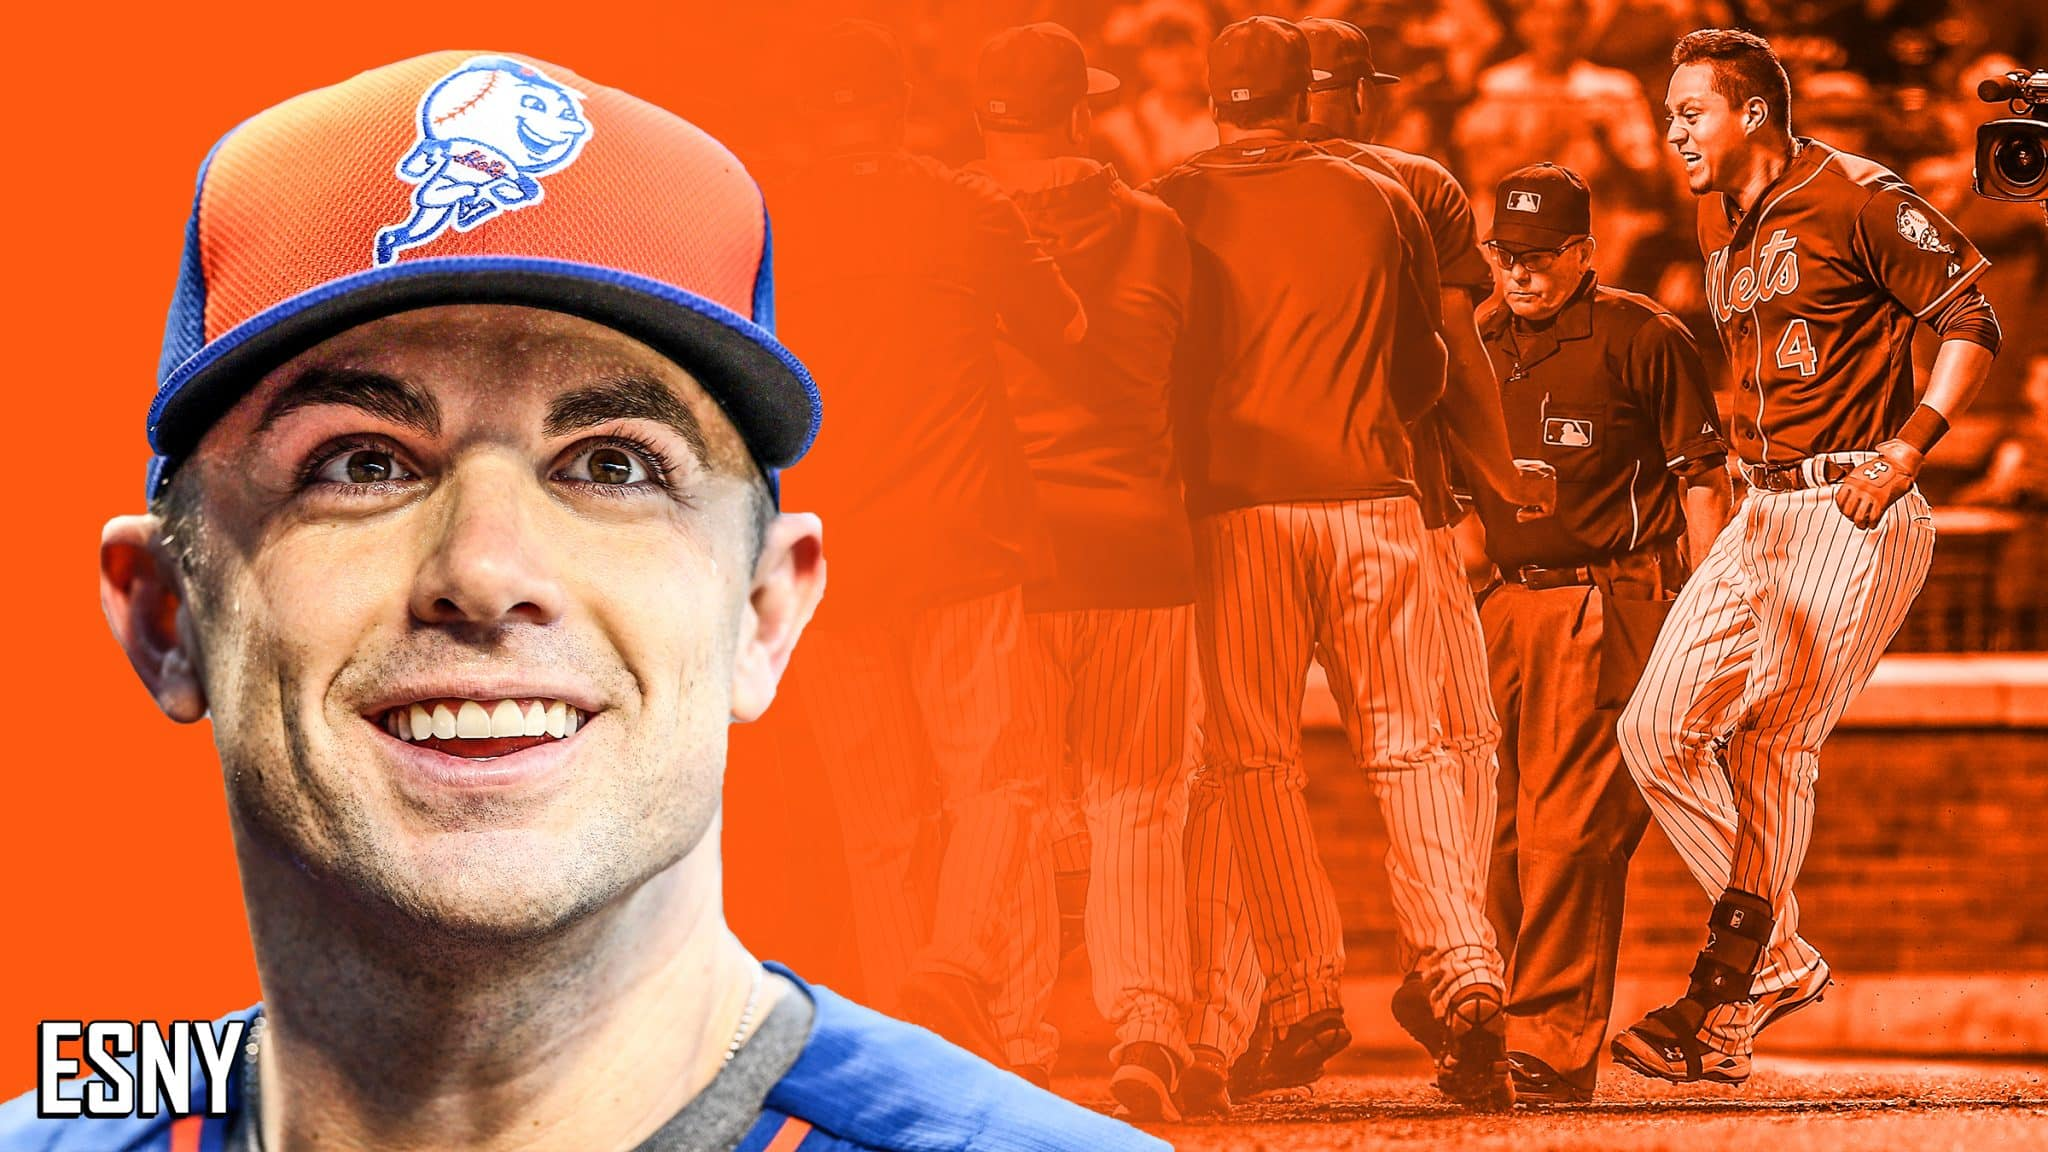 New York Mets Past Decade Explained Through 10 Random Games